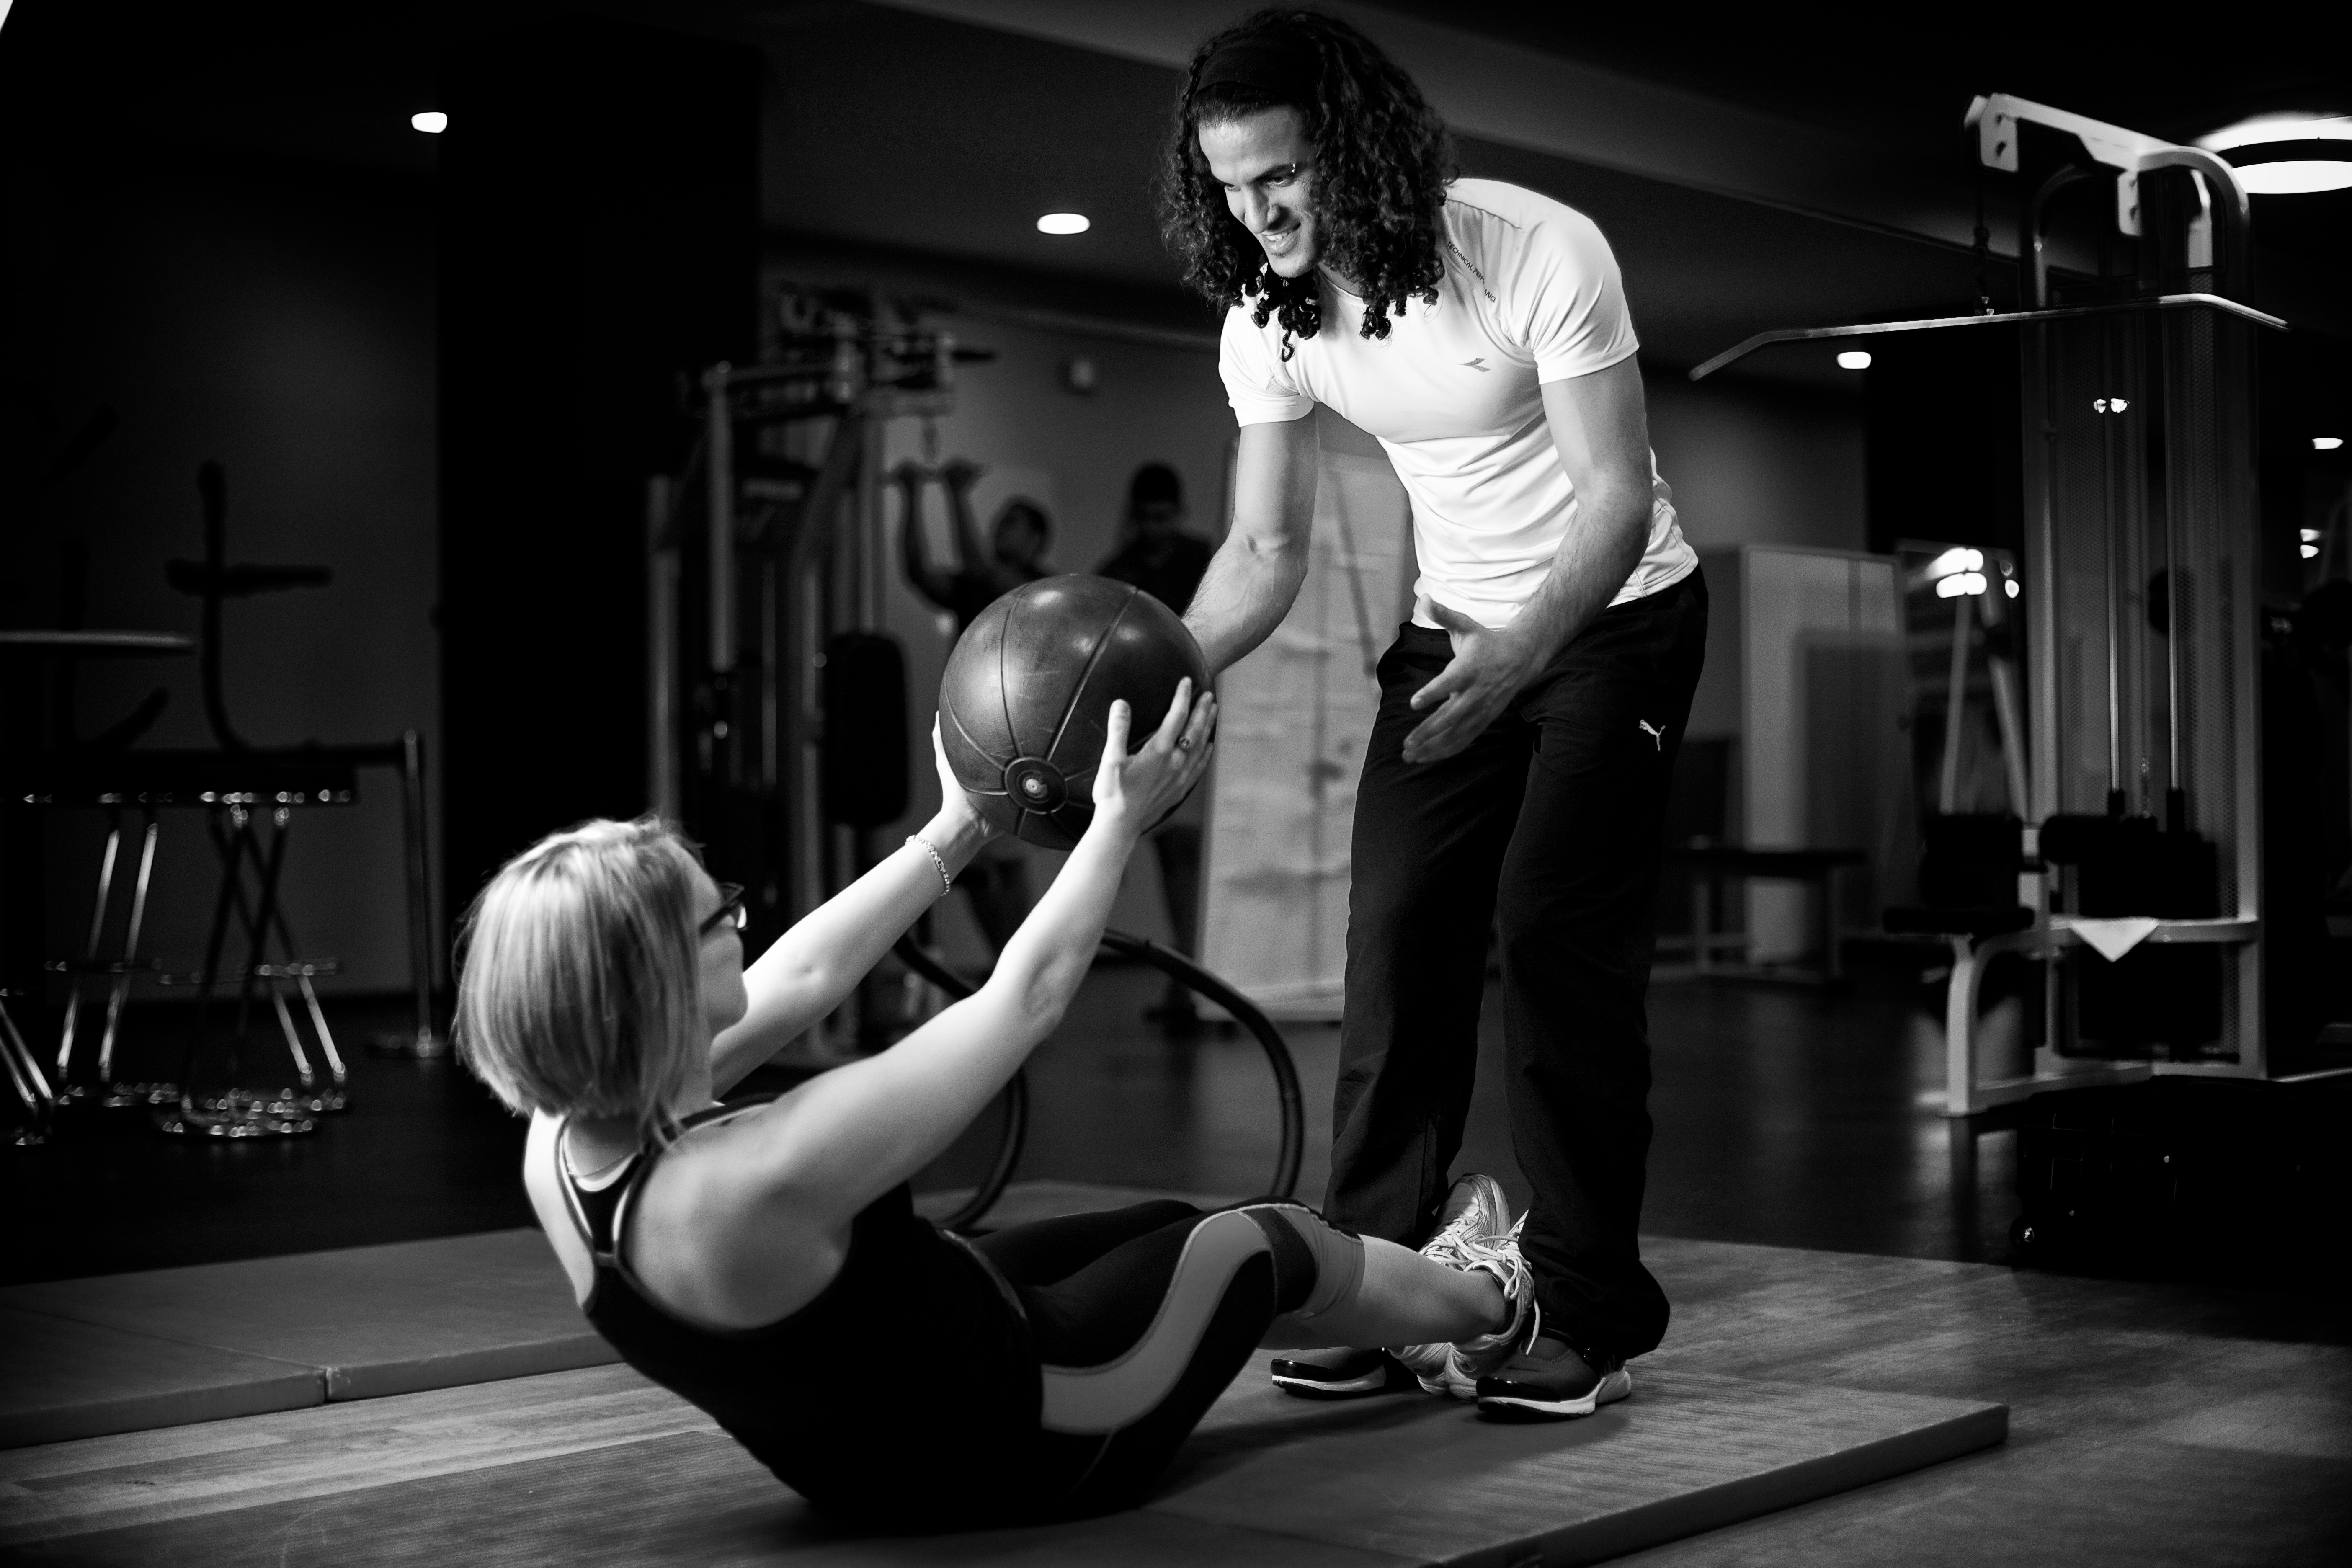 Personal Trainer zeigt Übung